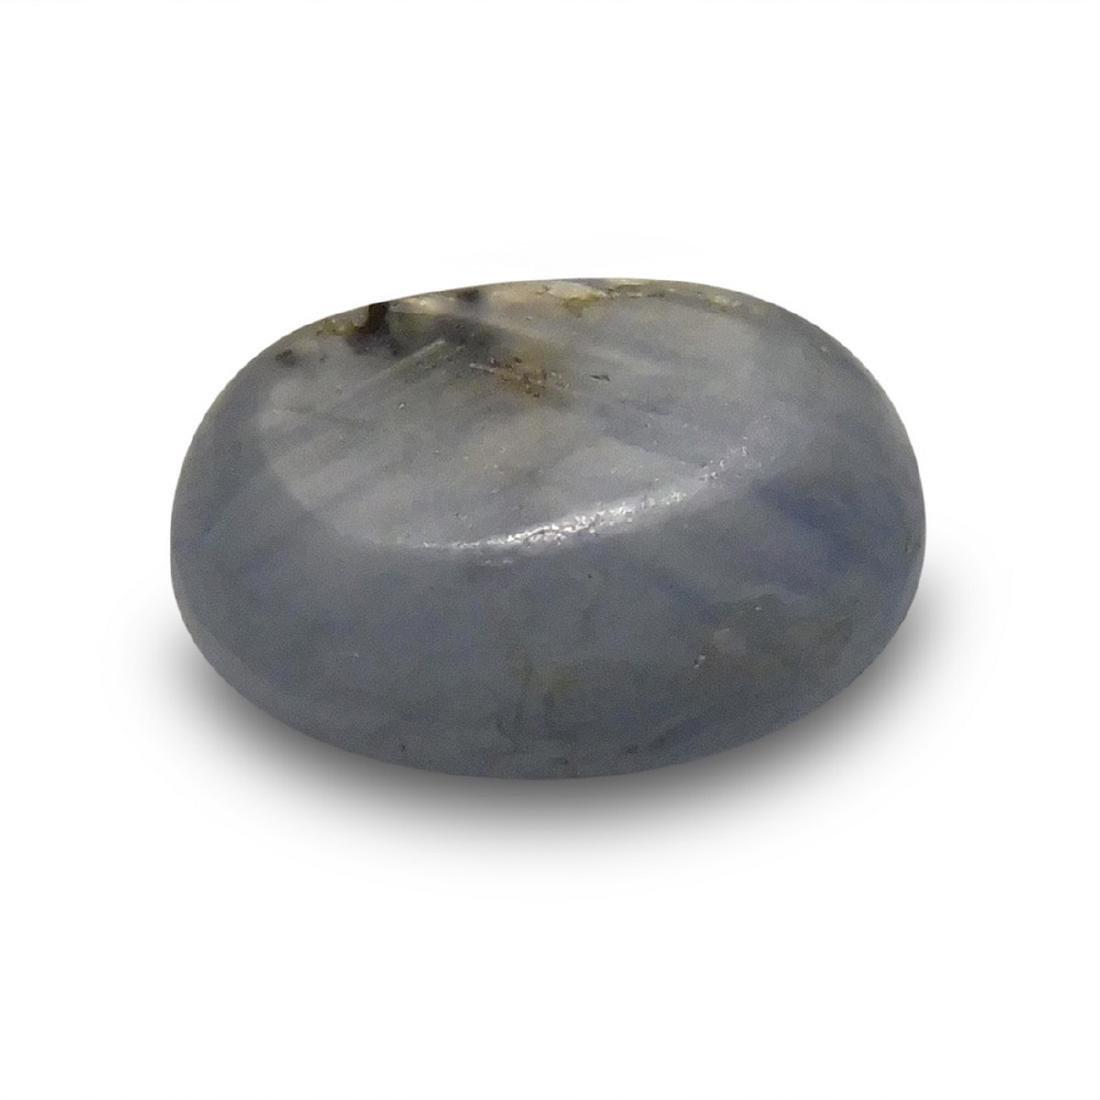 4.05 Carat Loose Oval Star Sapphire - 5